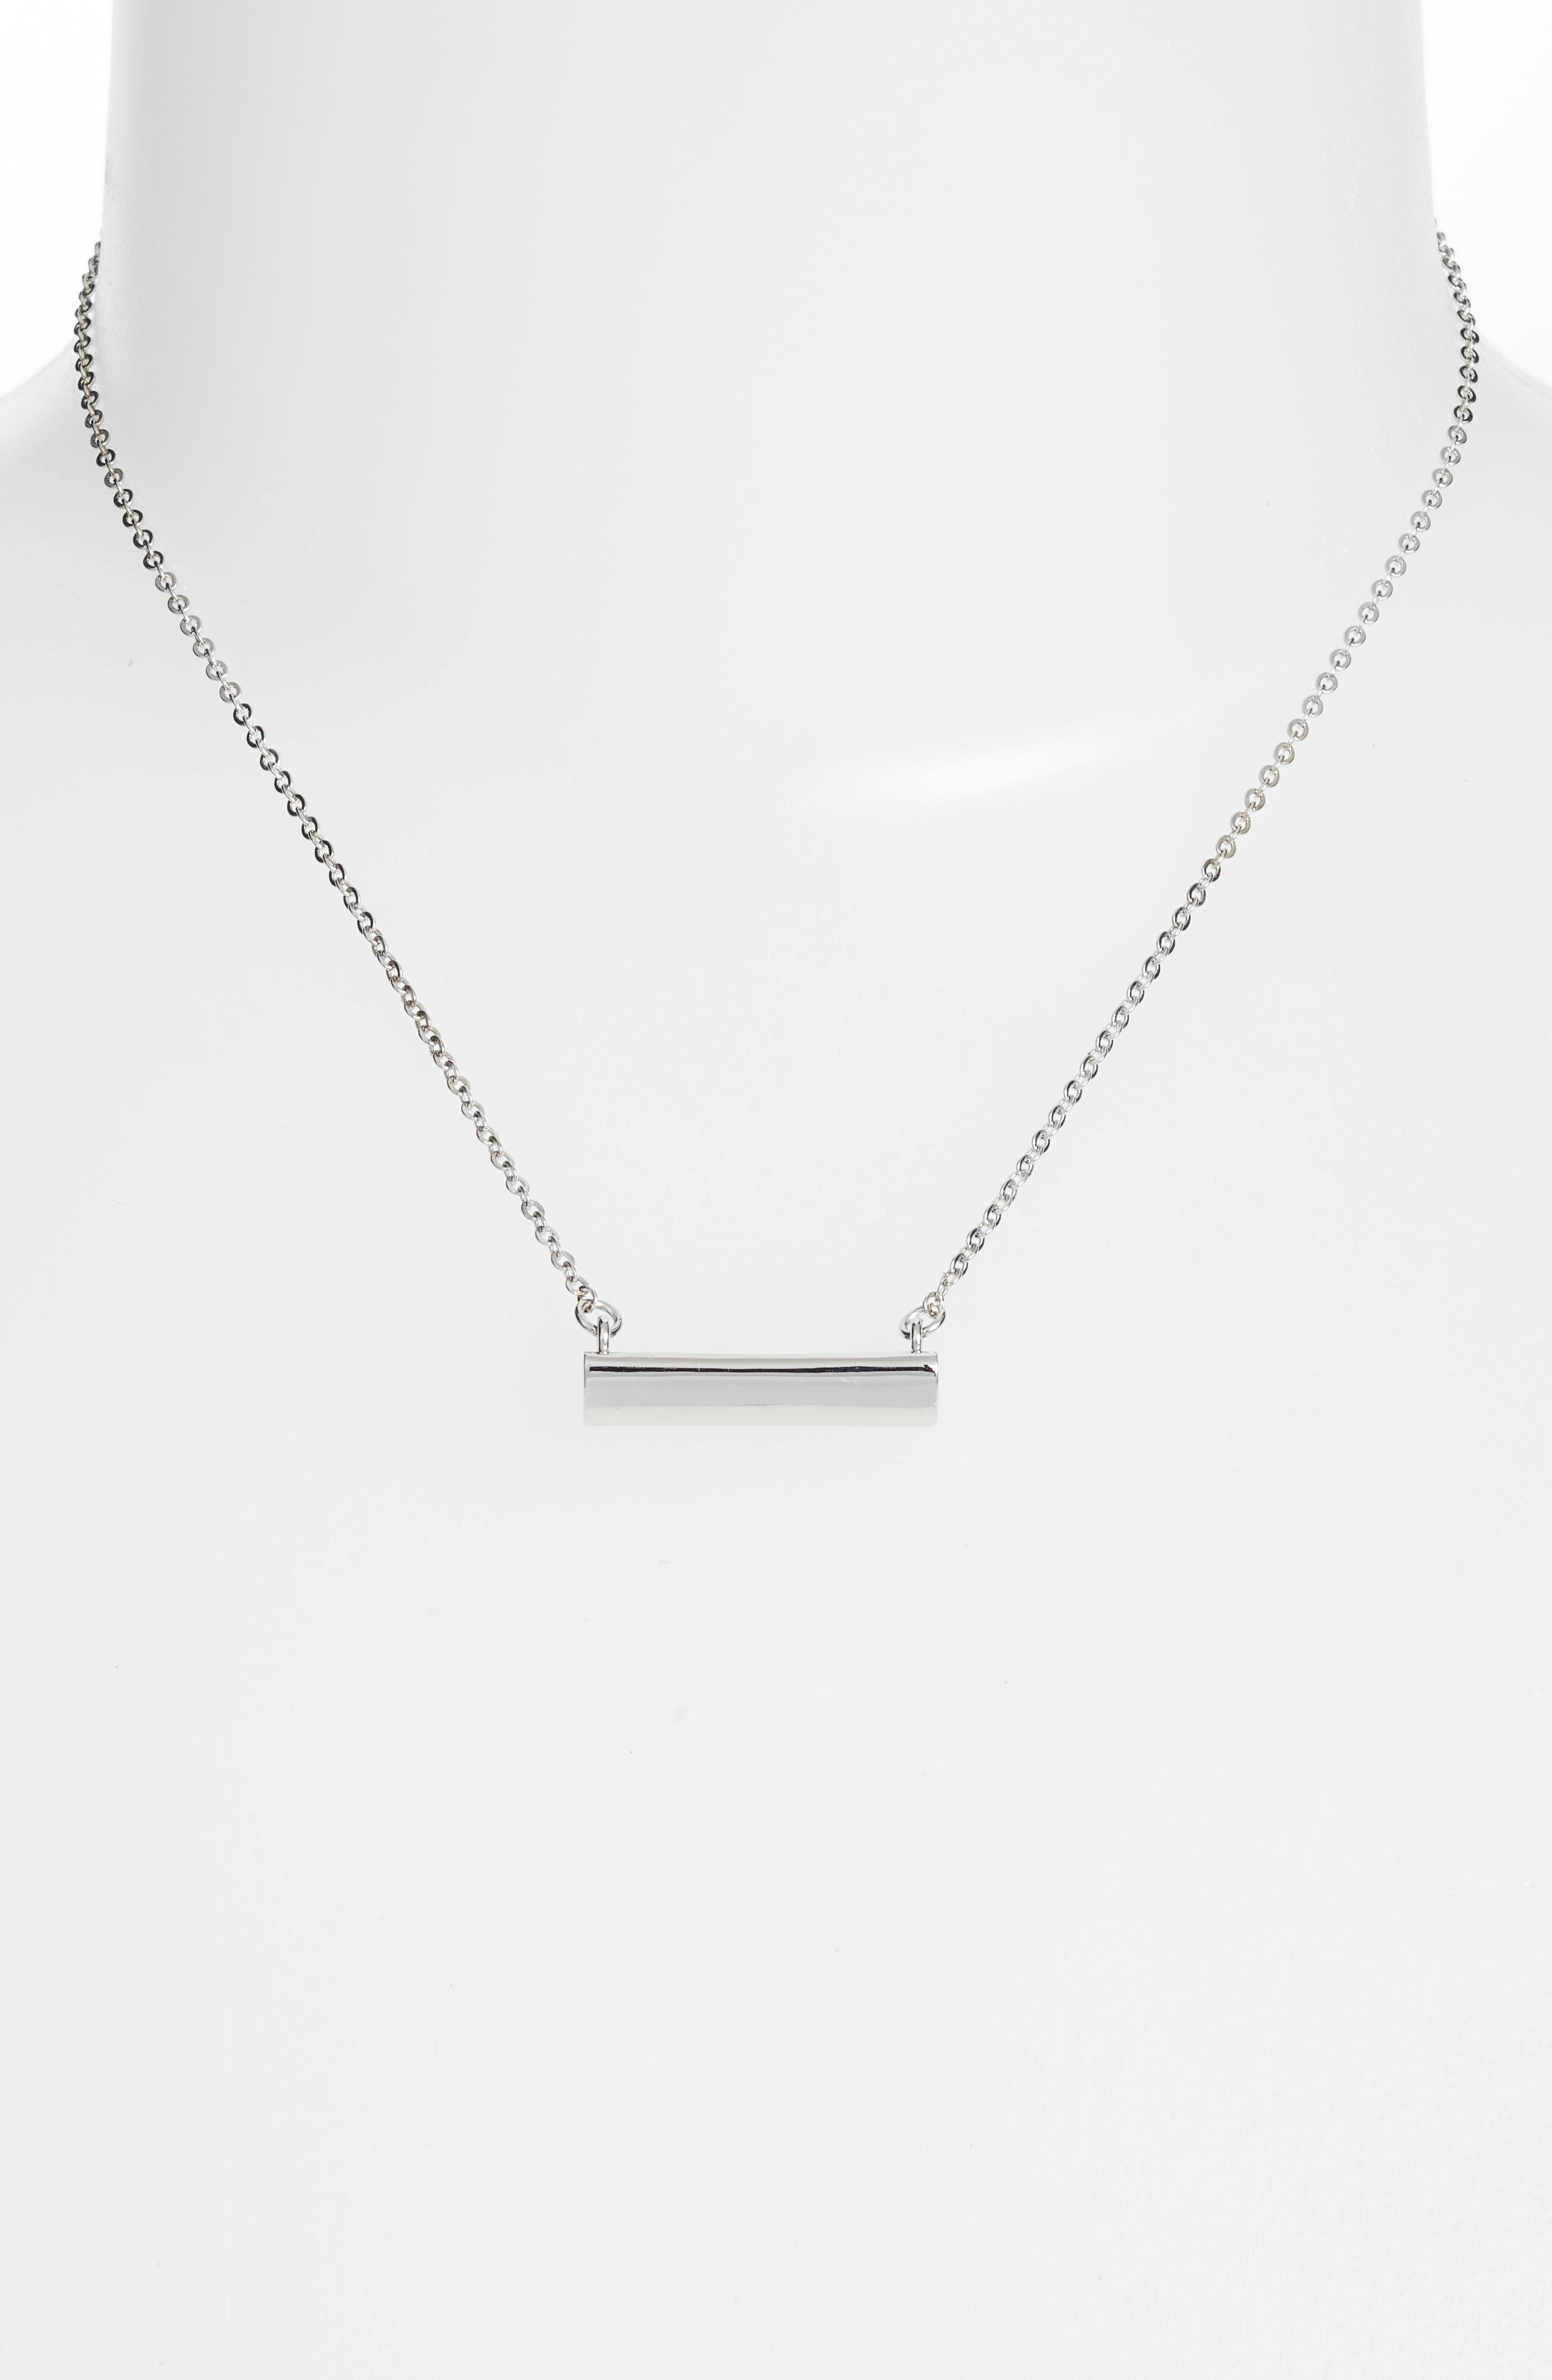 Heart Shaped Bar Pendant Necklace,                             Alternate thumbnail 2, color,                             SILVER